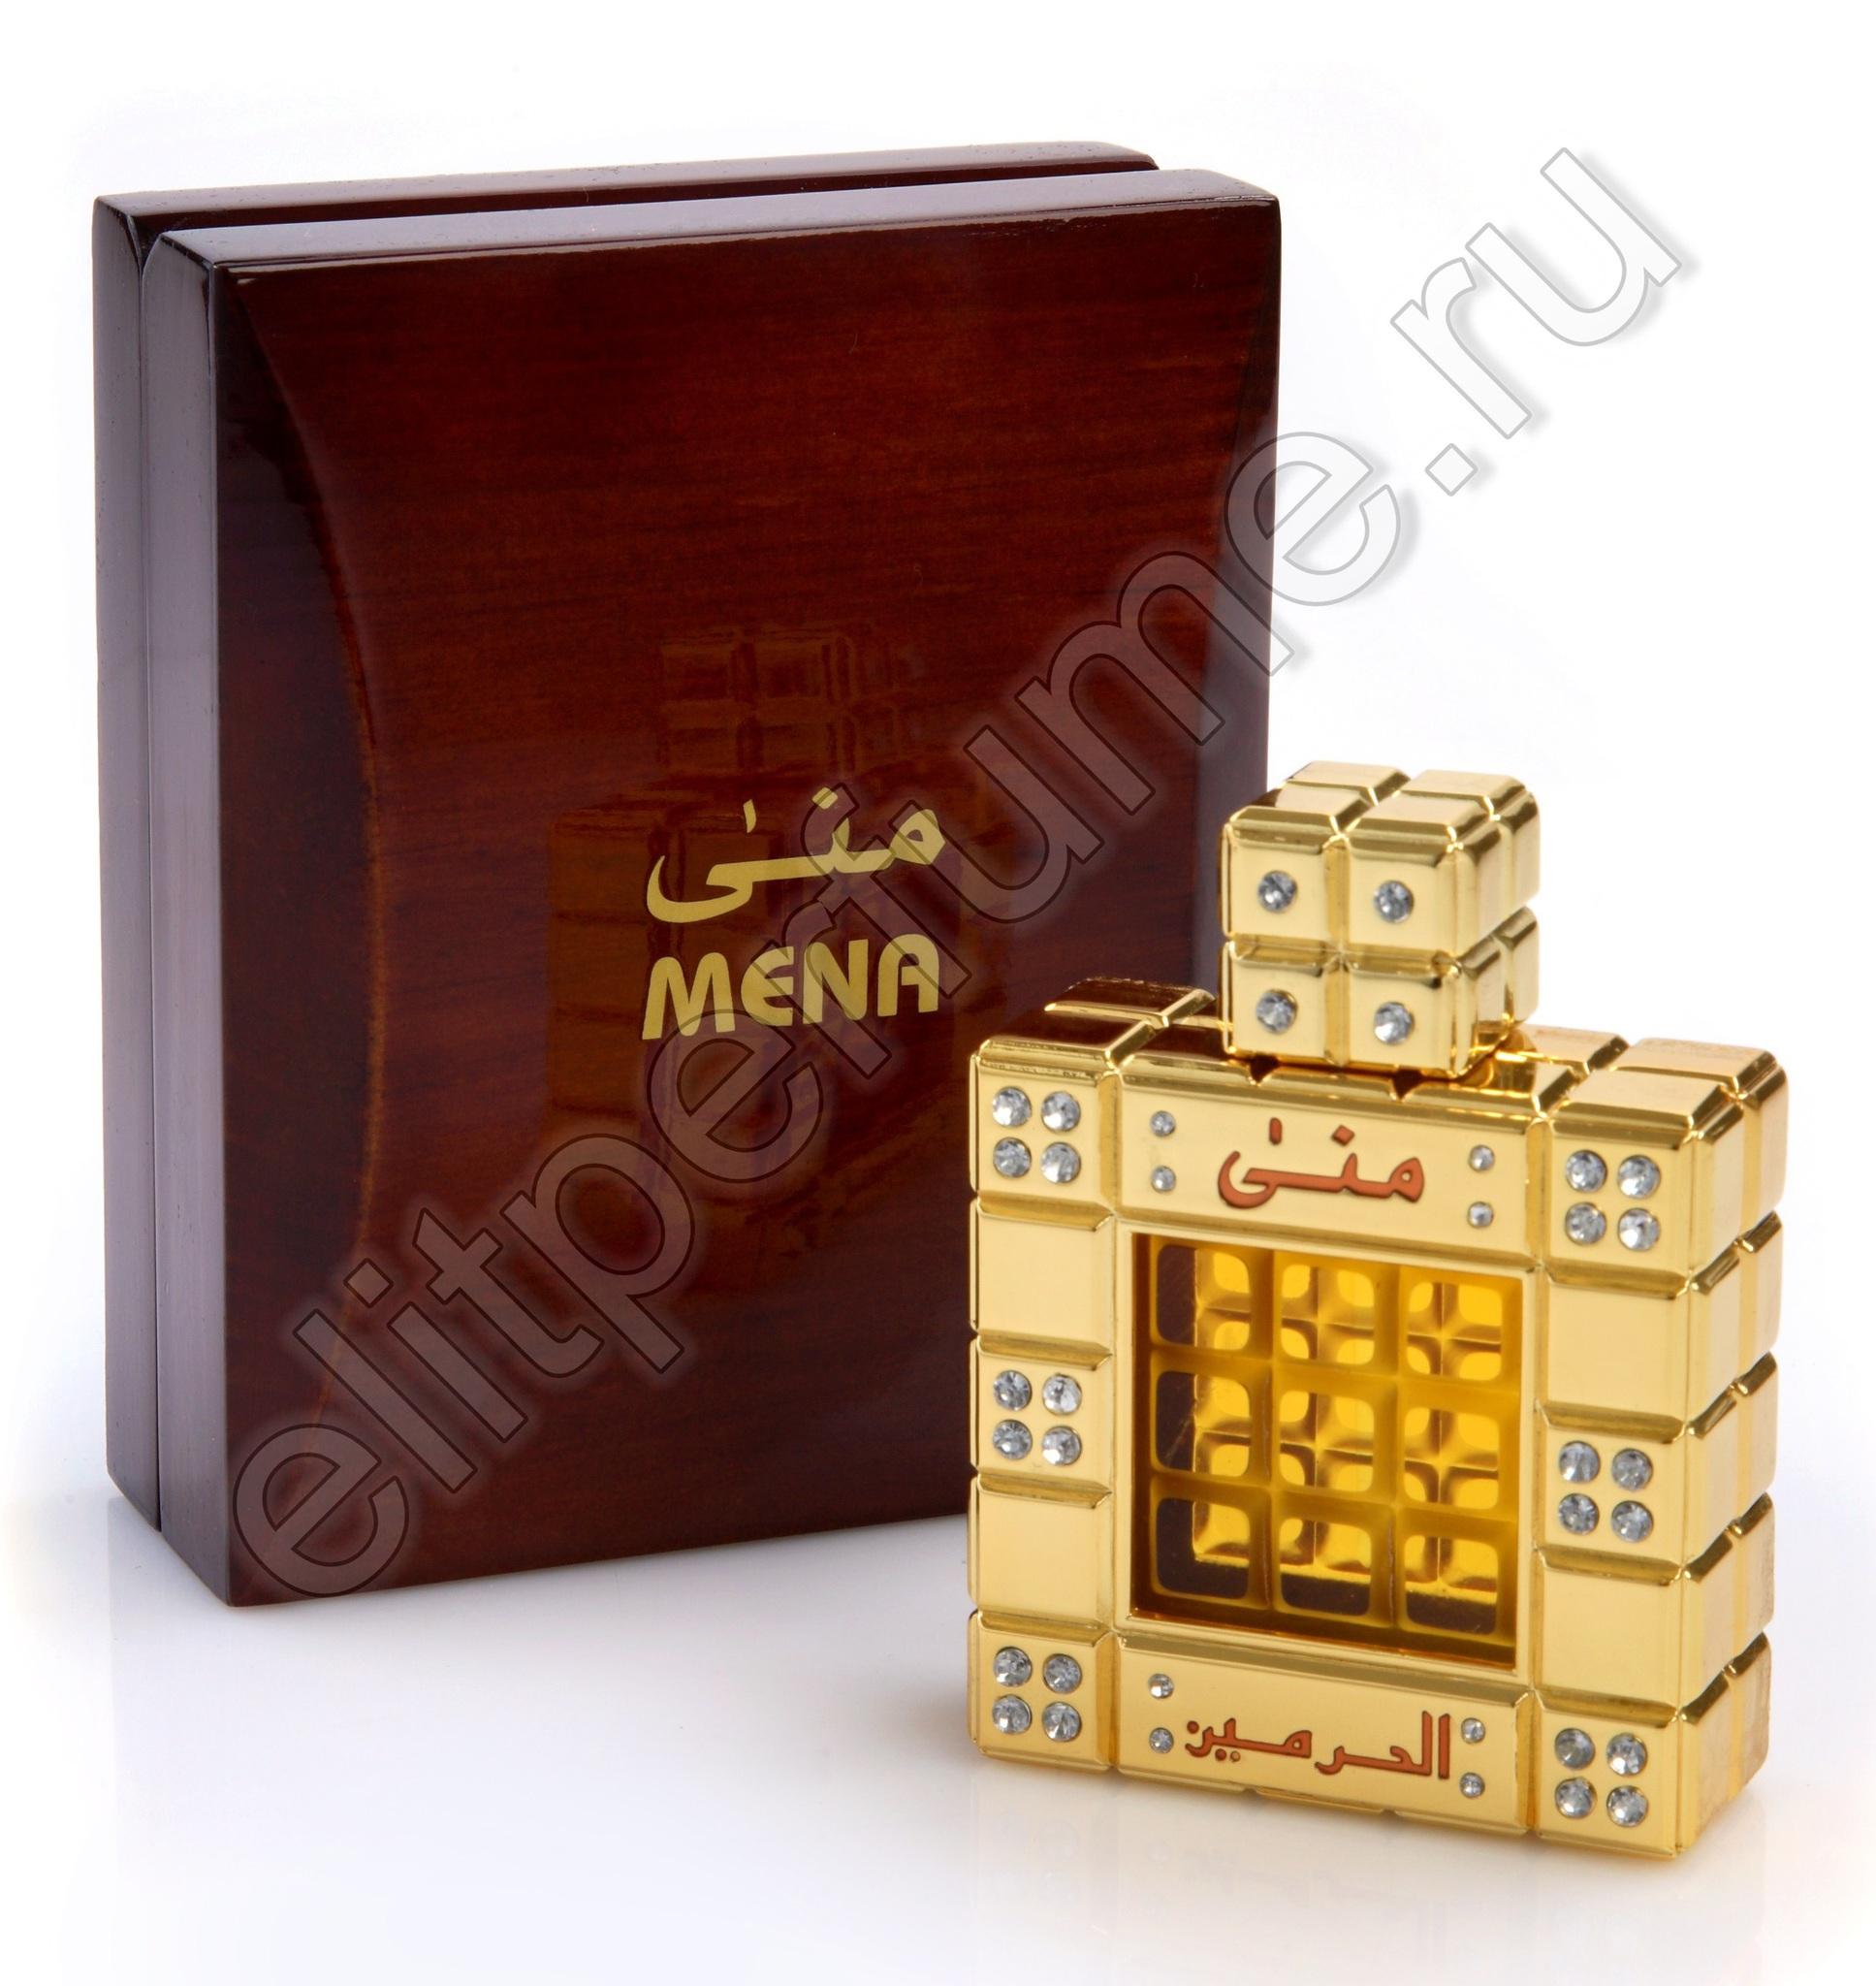 Пробники для духов Мина Mena 1 мл арабские масляные духи от Аль Харамайн Al Haramin Perfumes